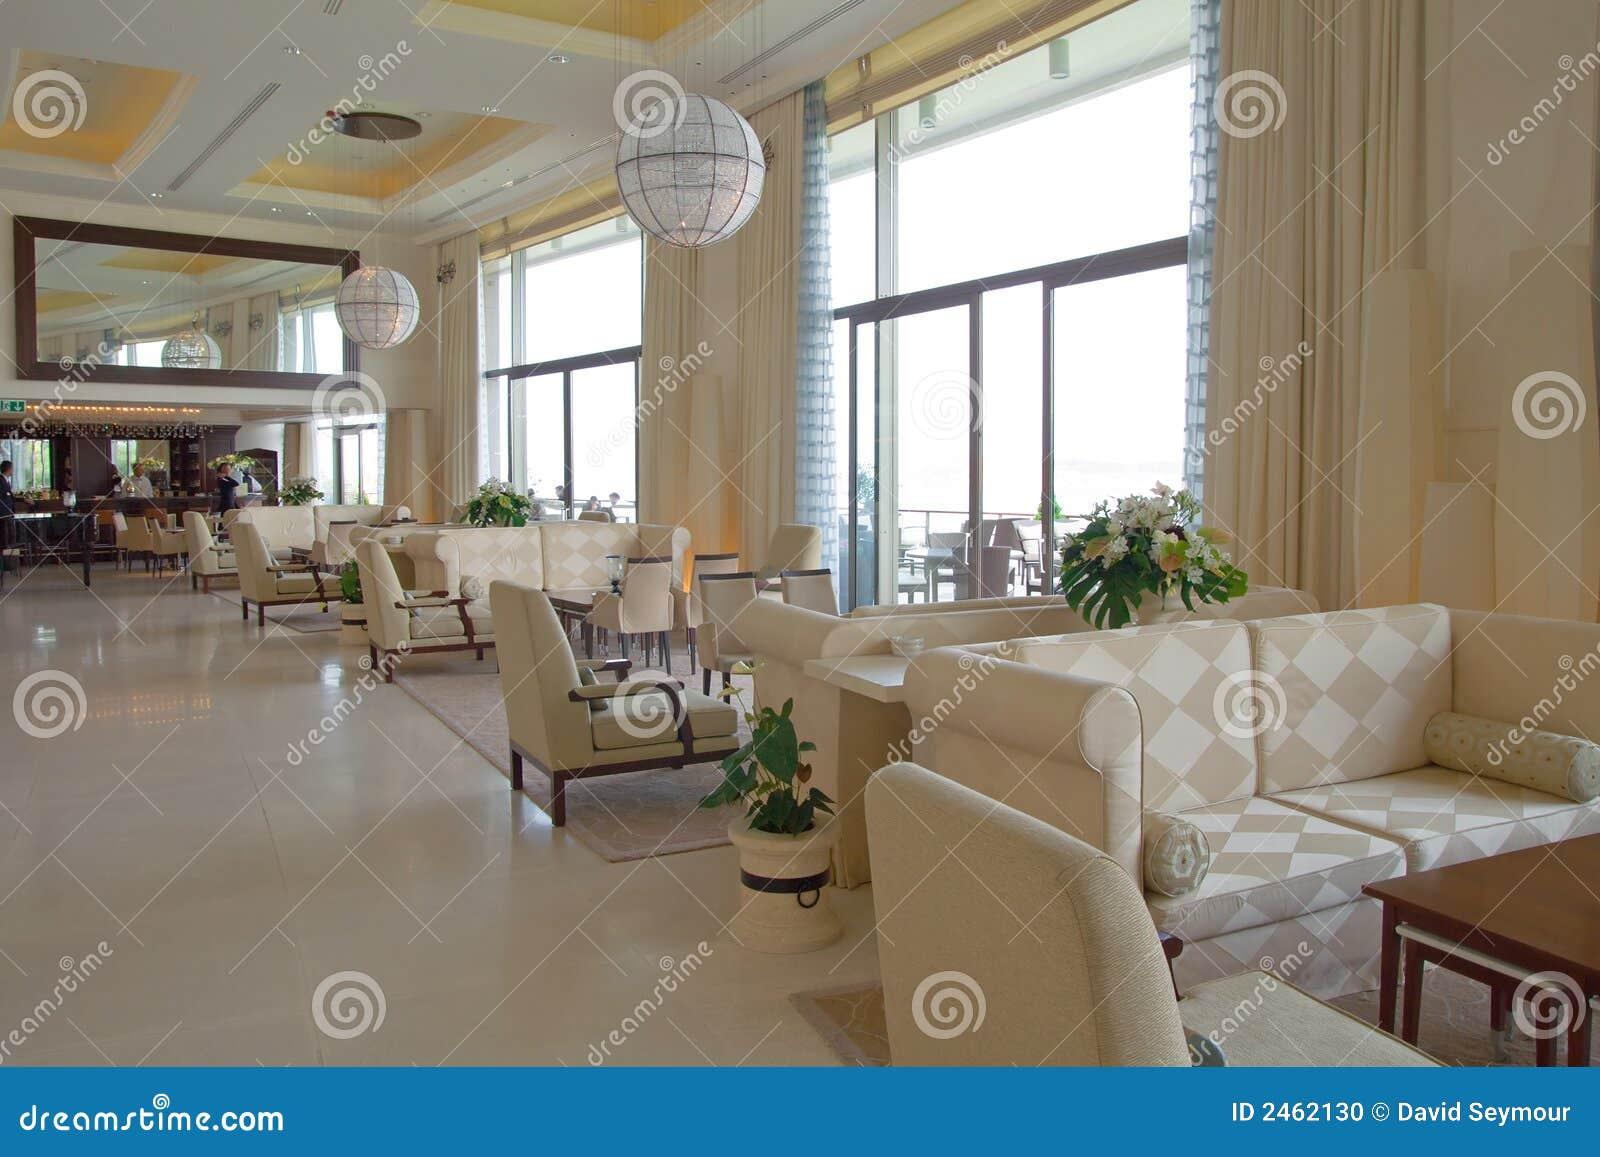 Sala De Estar Luxo ~ Sala De Estar Do Hotel De Luxo Foto de Stock  Imagem 2462130